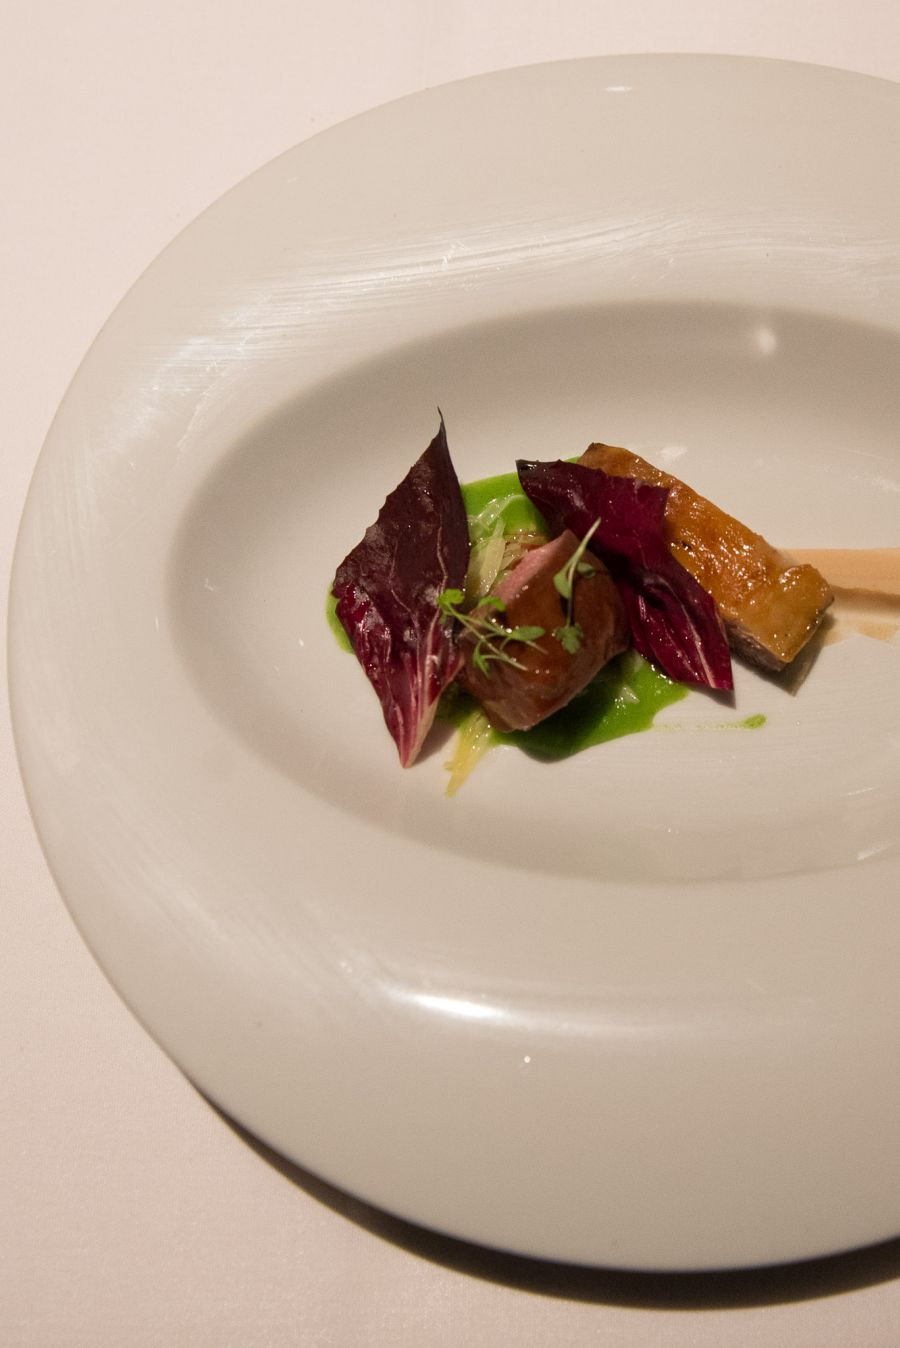 Amelia Park lamb rump and belly, parsley gravy